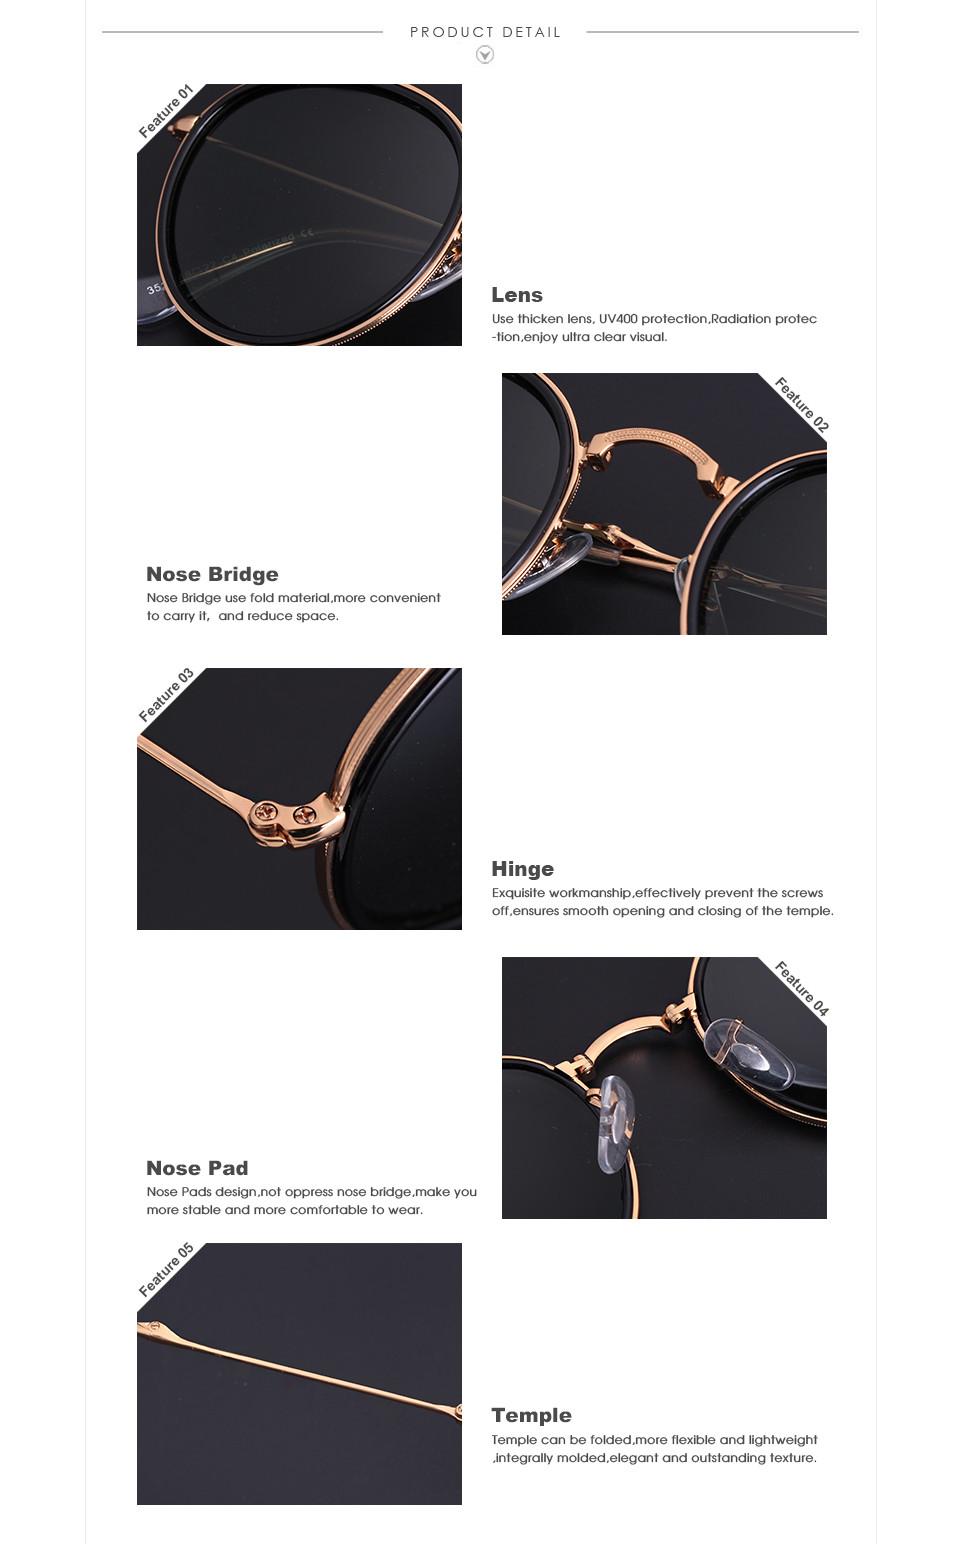 65ebeb69403d hot sale cheap China Wholesale sunglasses new fashion folding sunglasses  2015